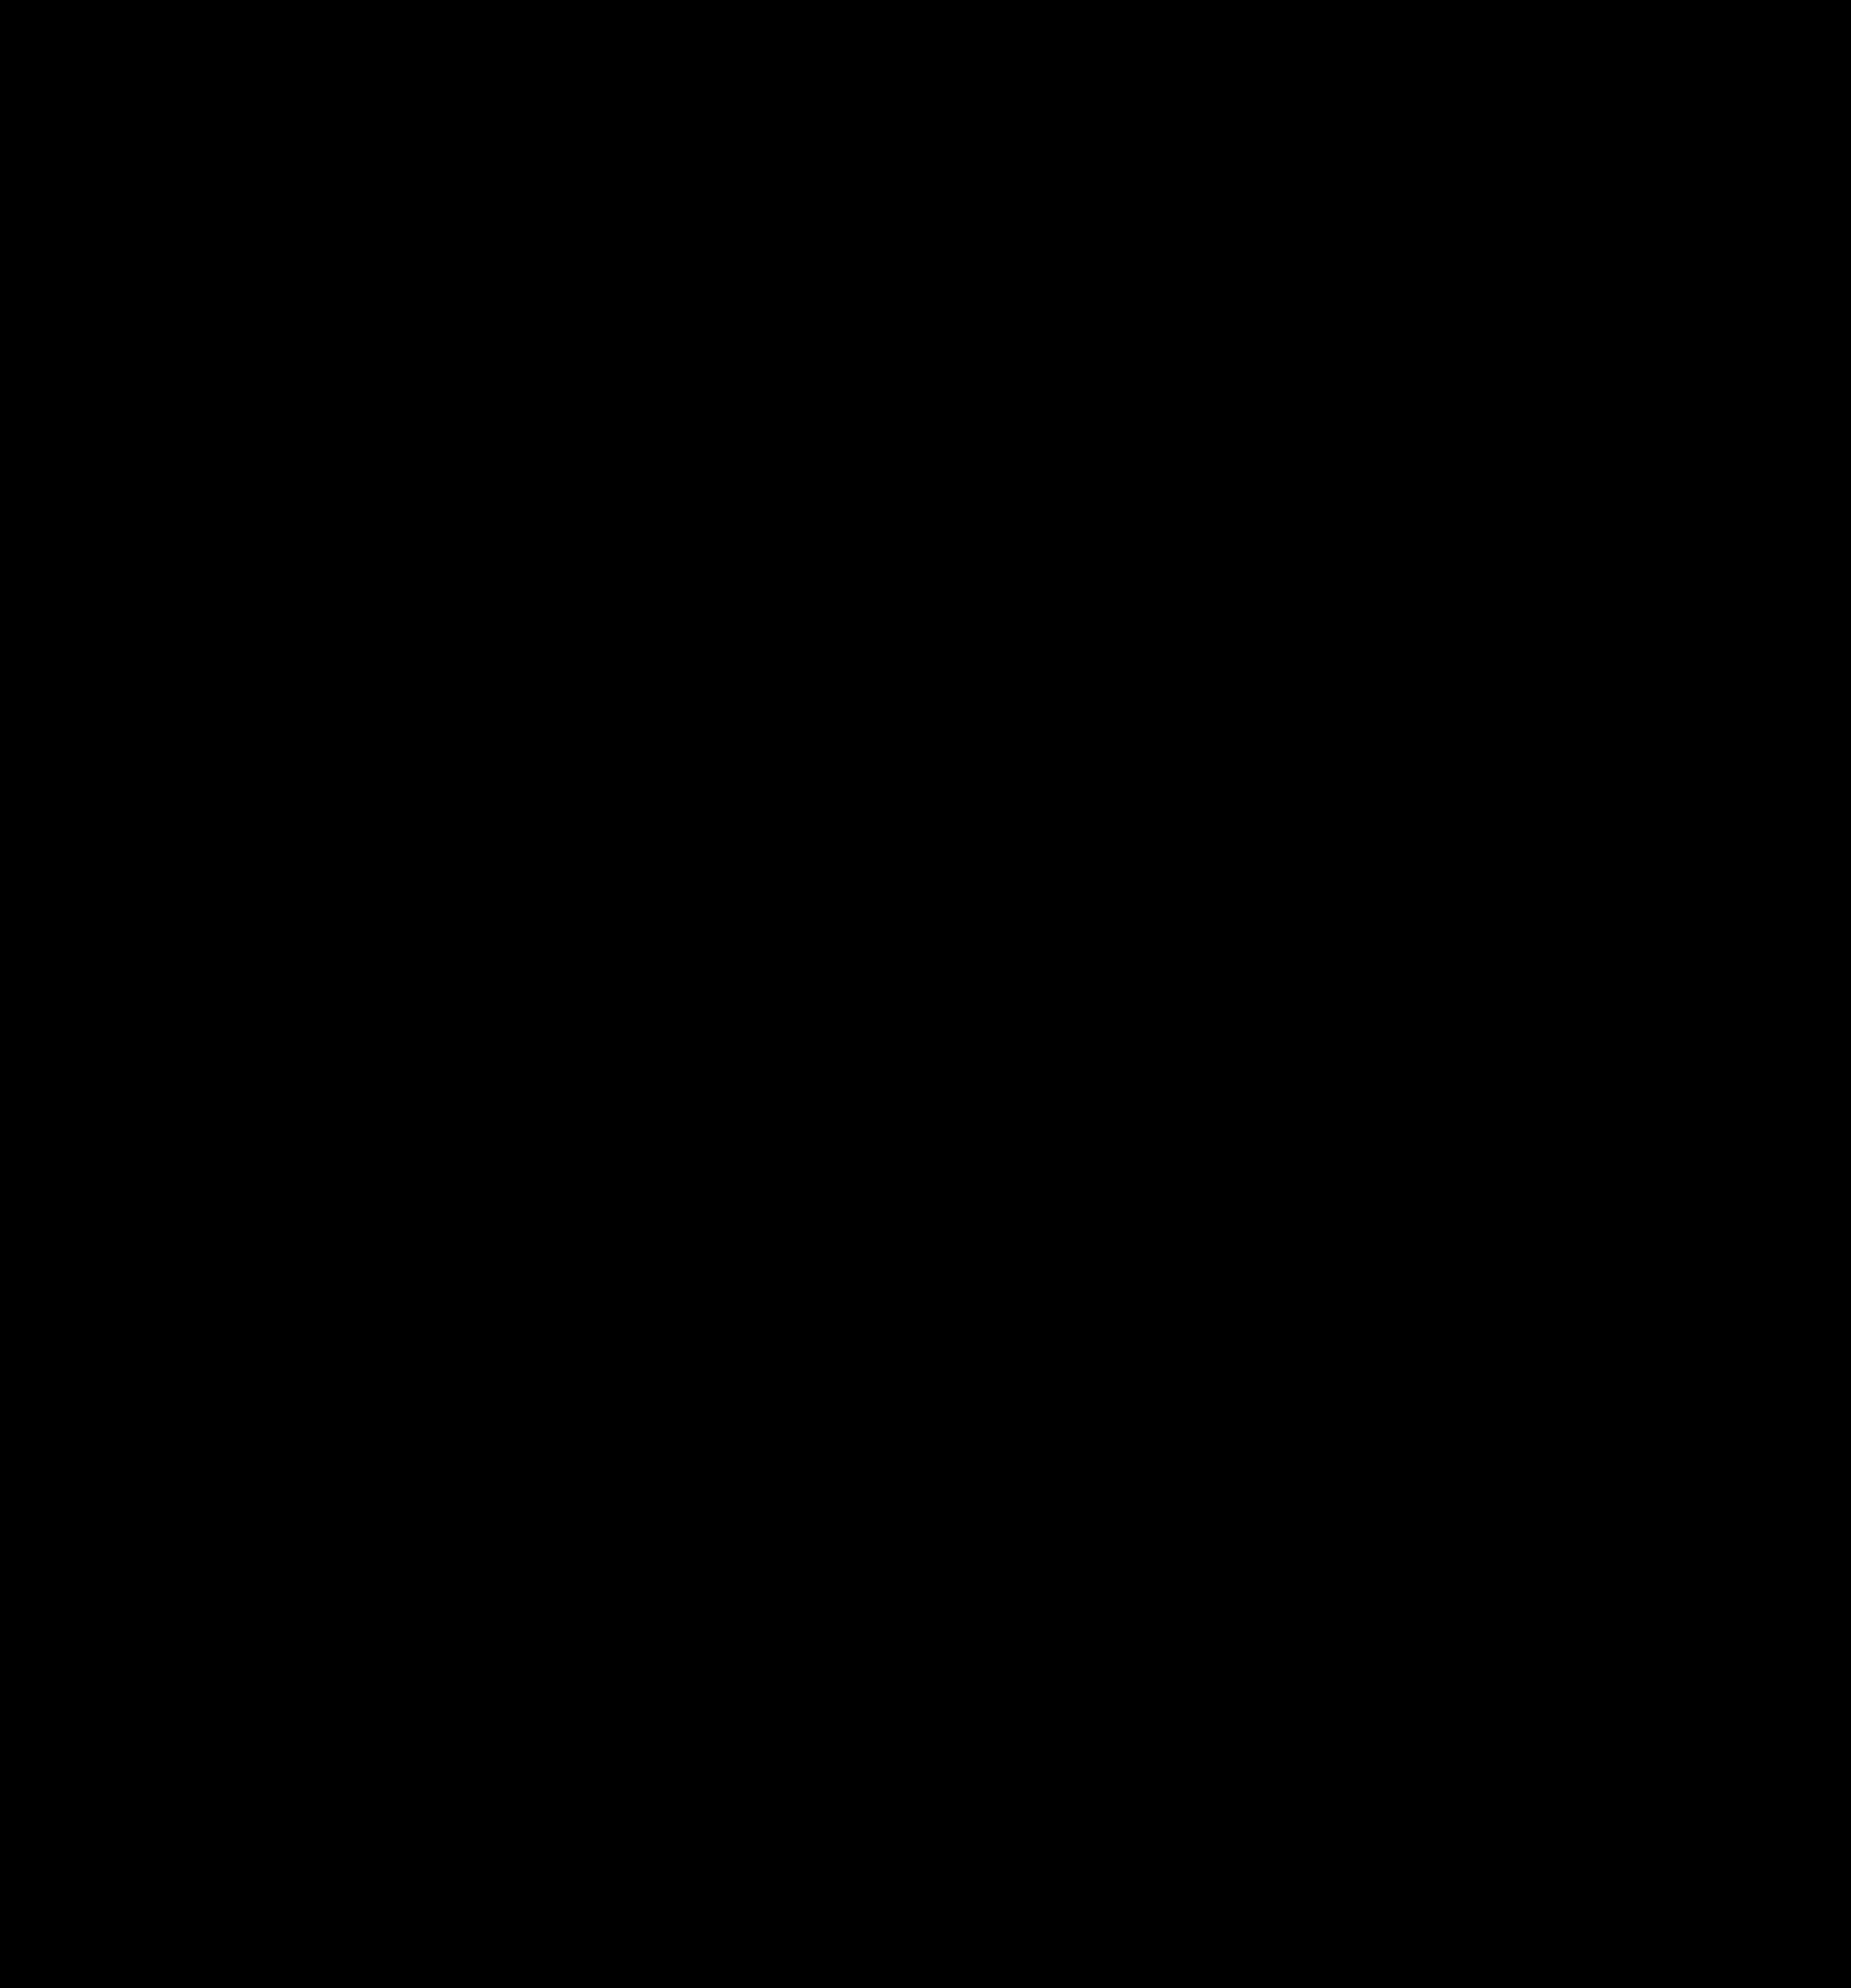 PPlogo stamp ver